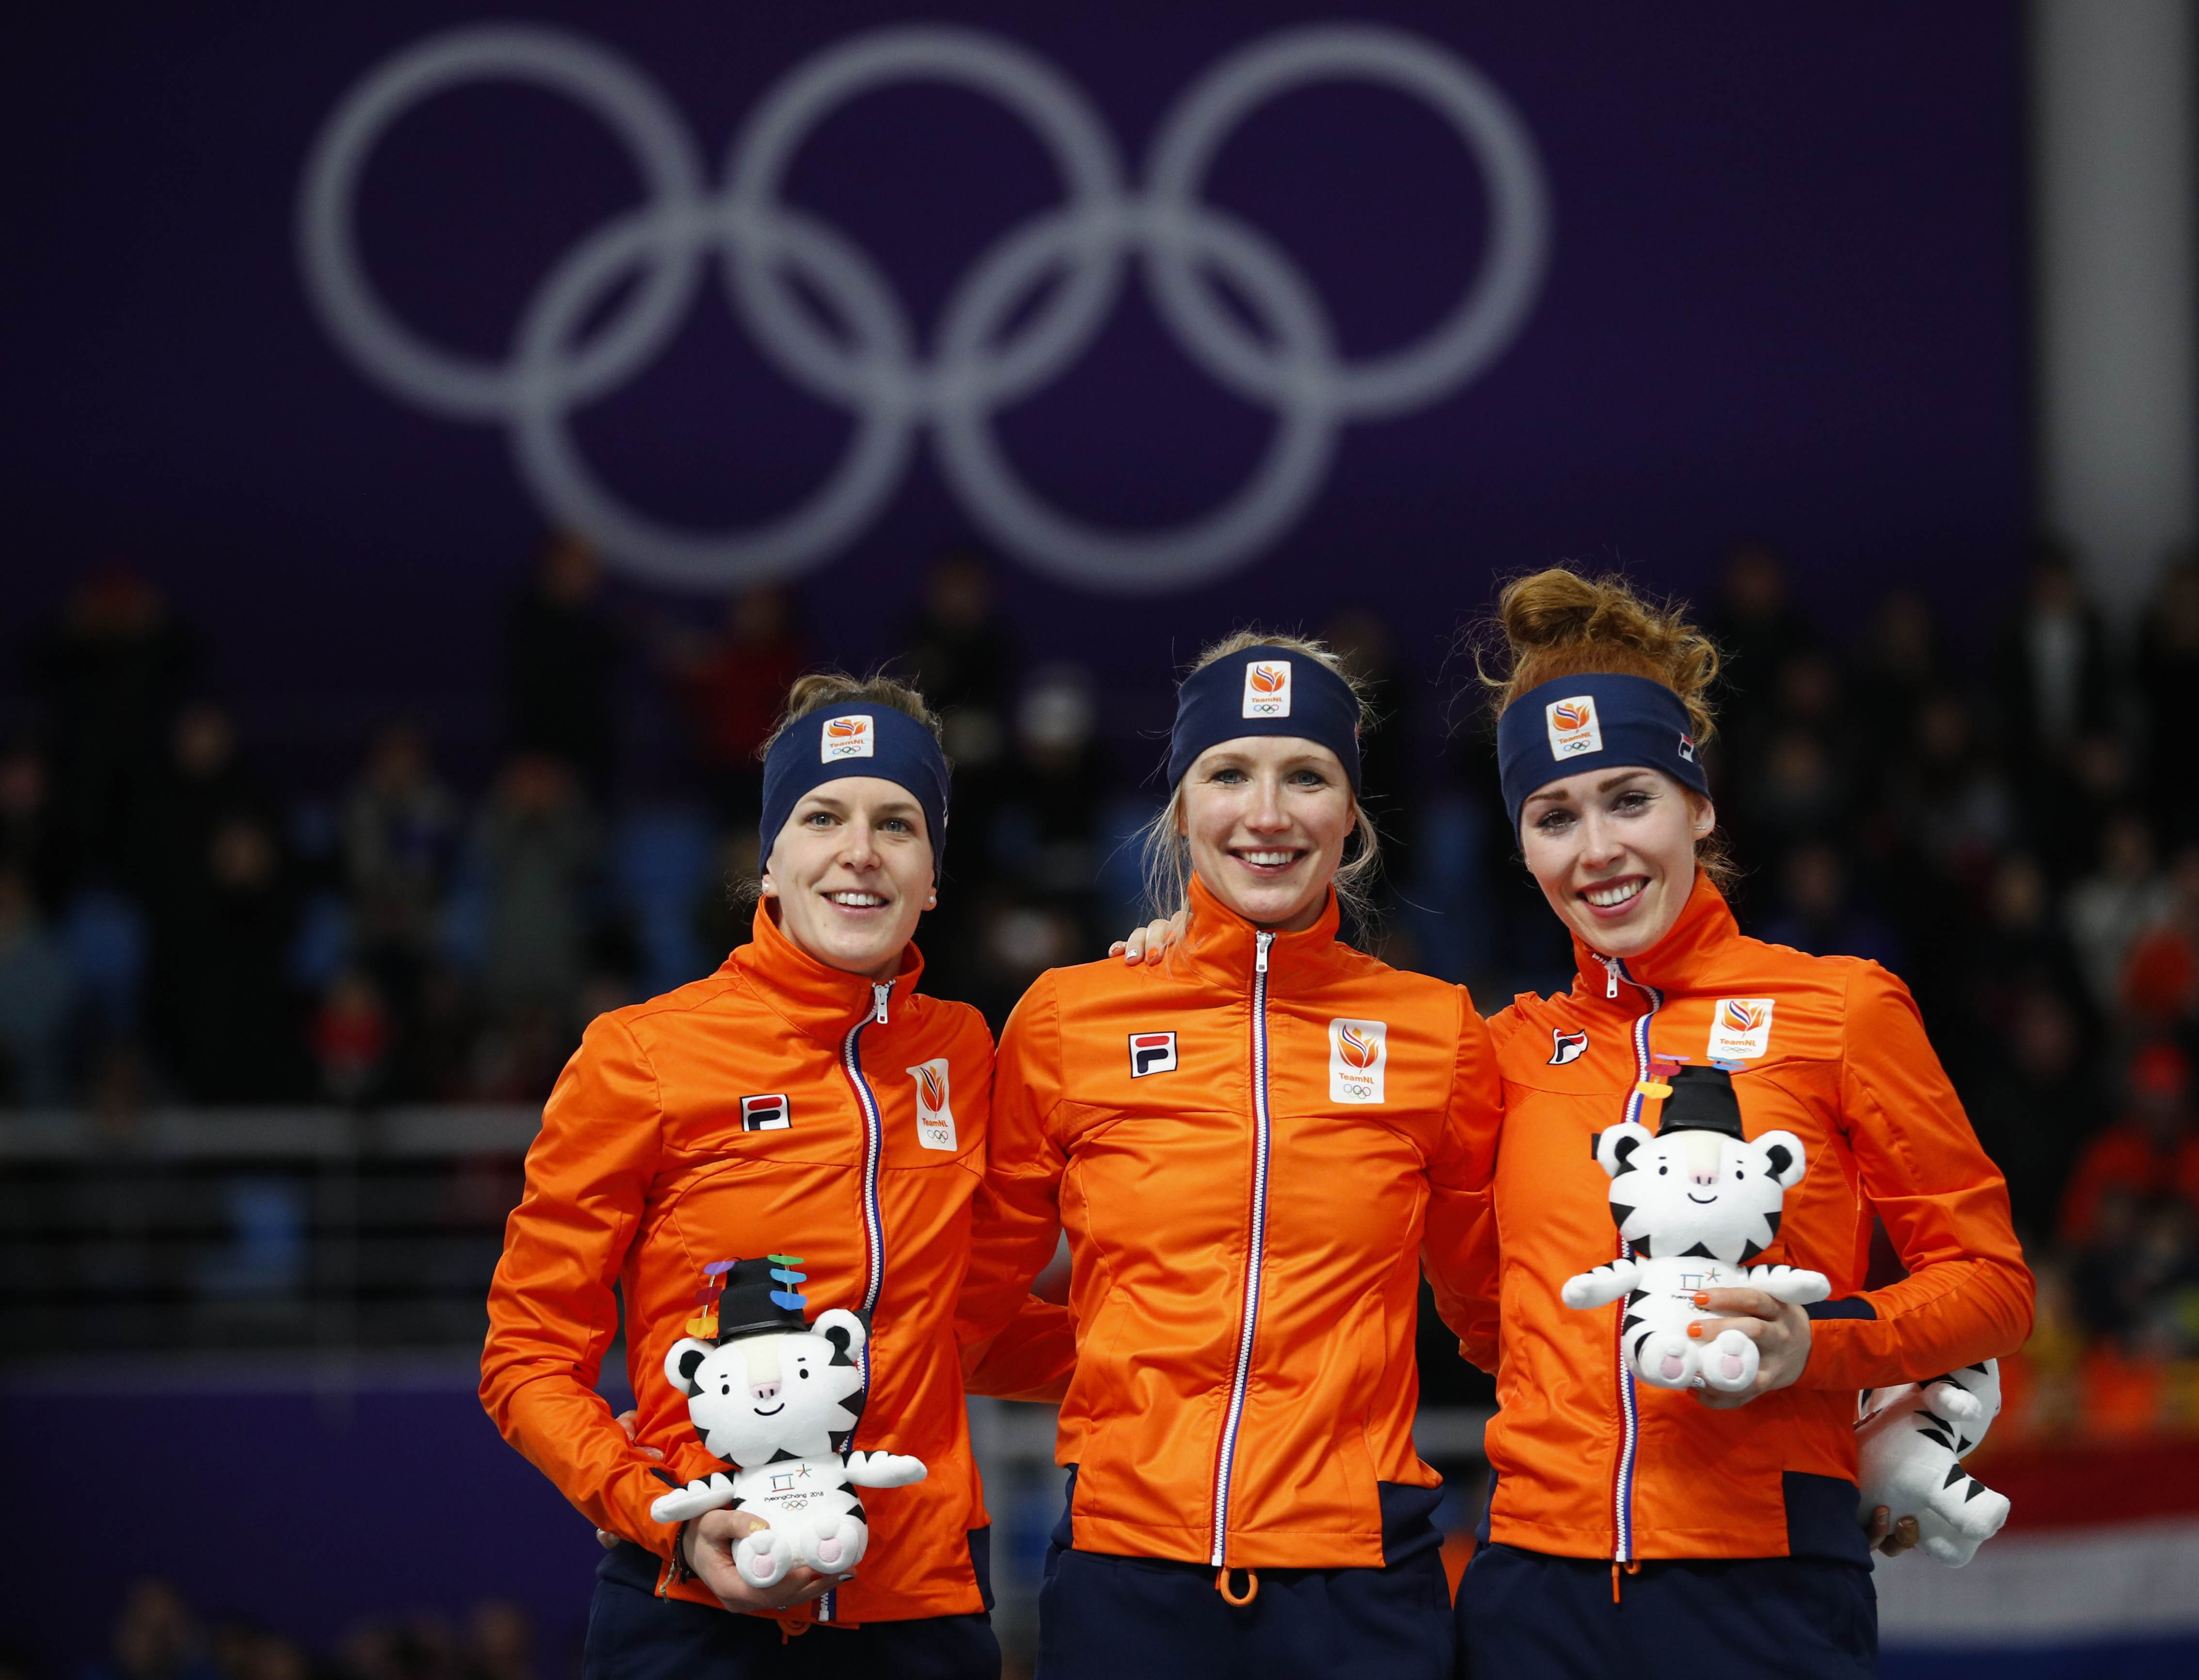 Achtereekte pakt goud, geheel Oranje podium op 3.000m